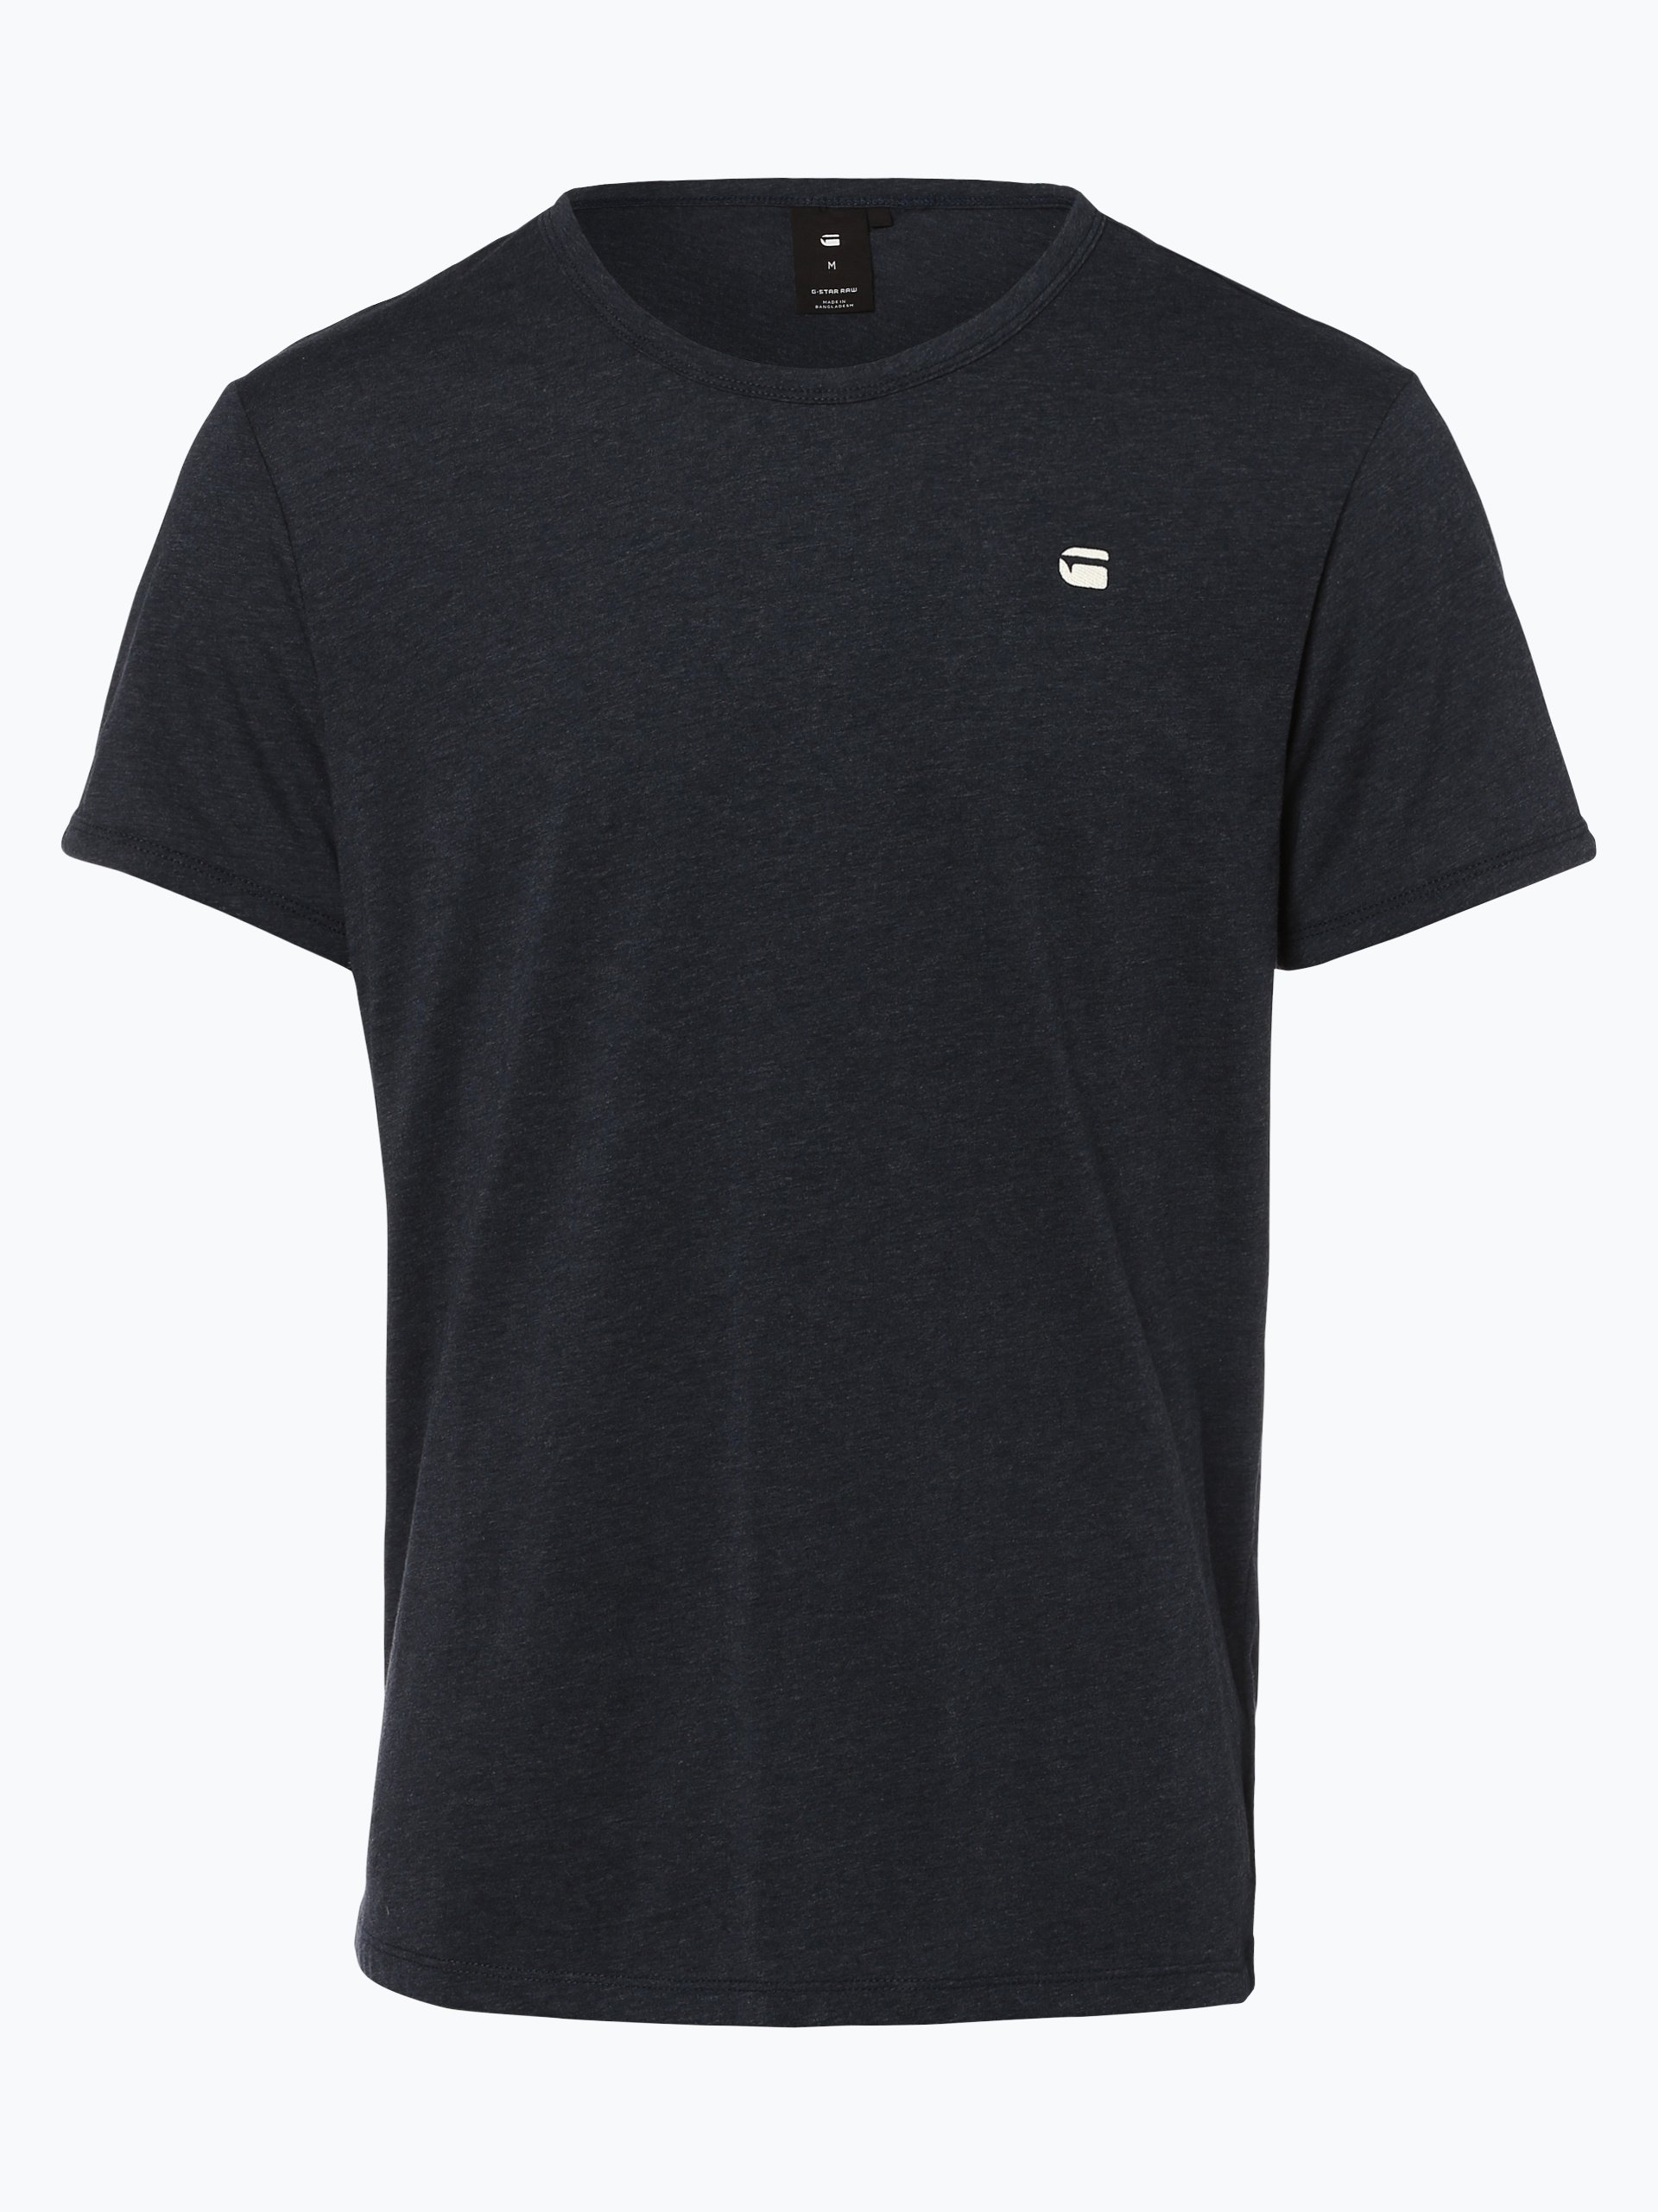 G-Star RAW T-shirt męski – Base-S